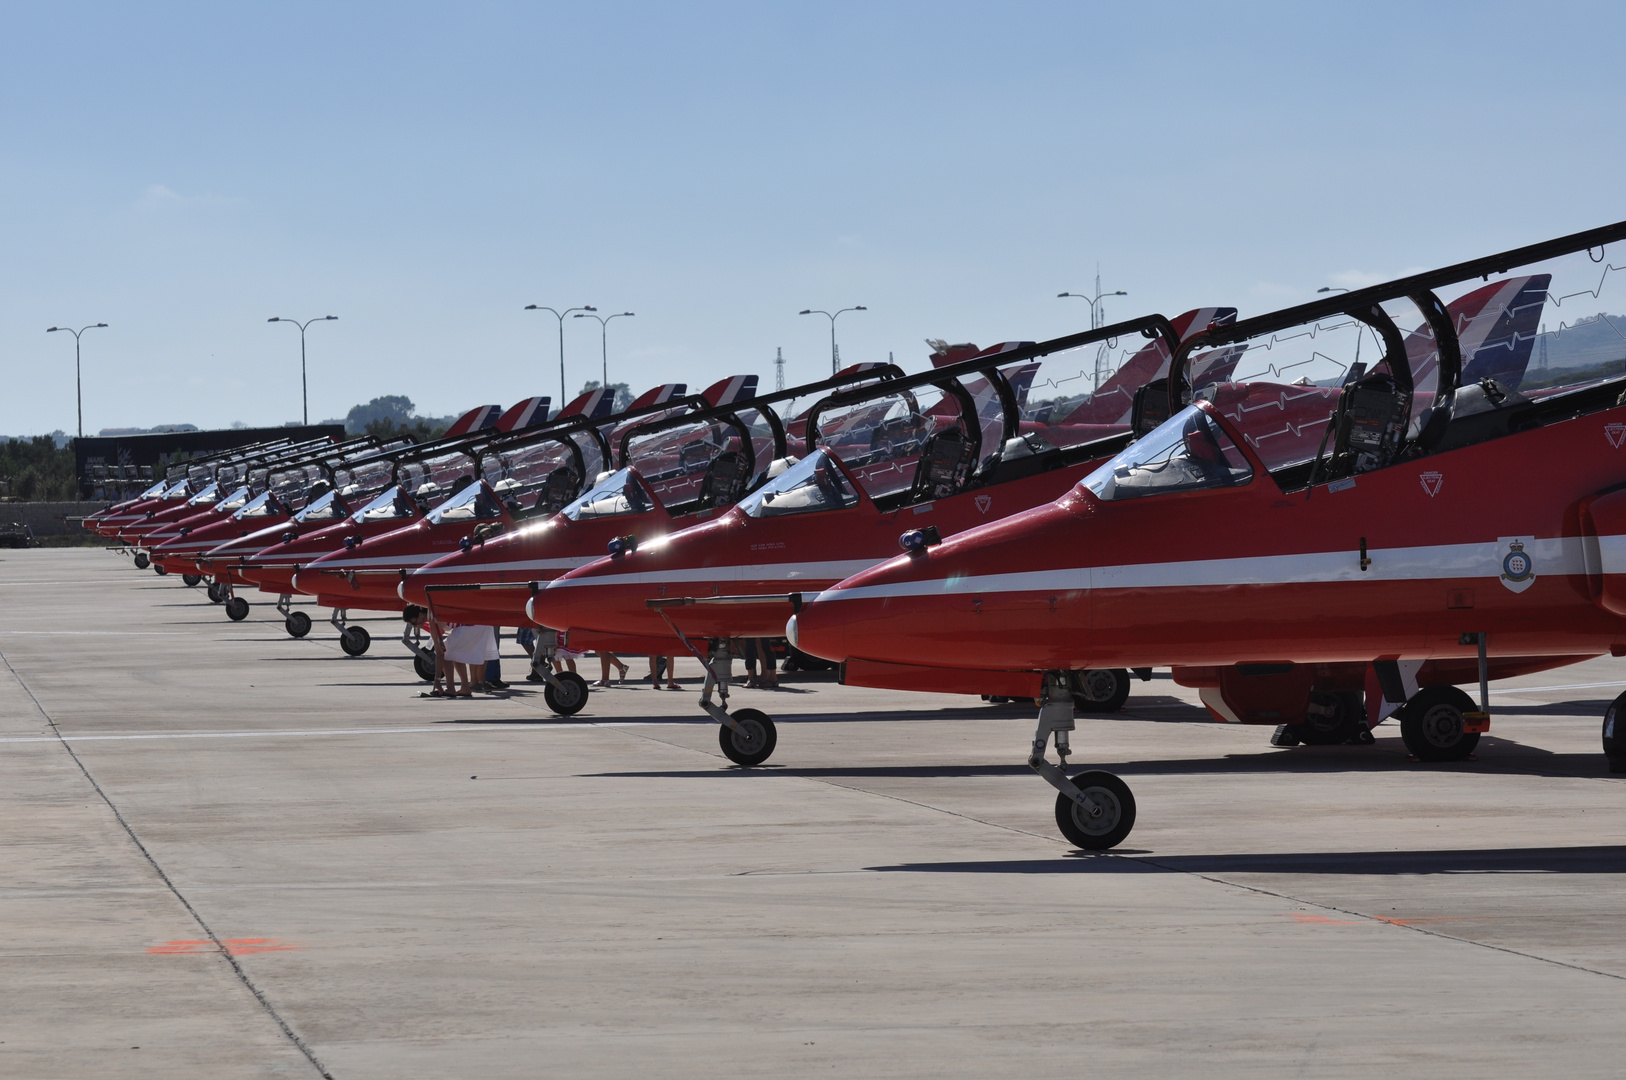 Malta International Airshow 2013 (13)